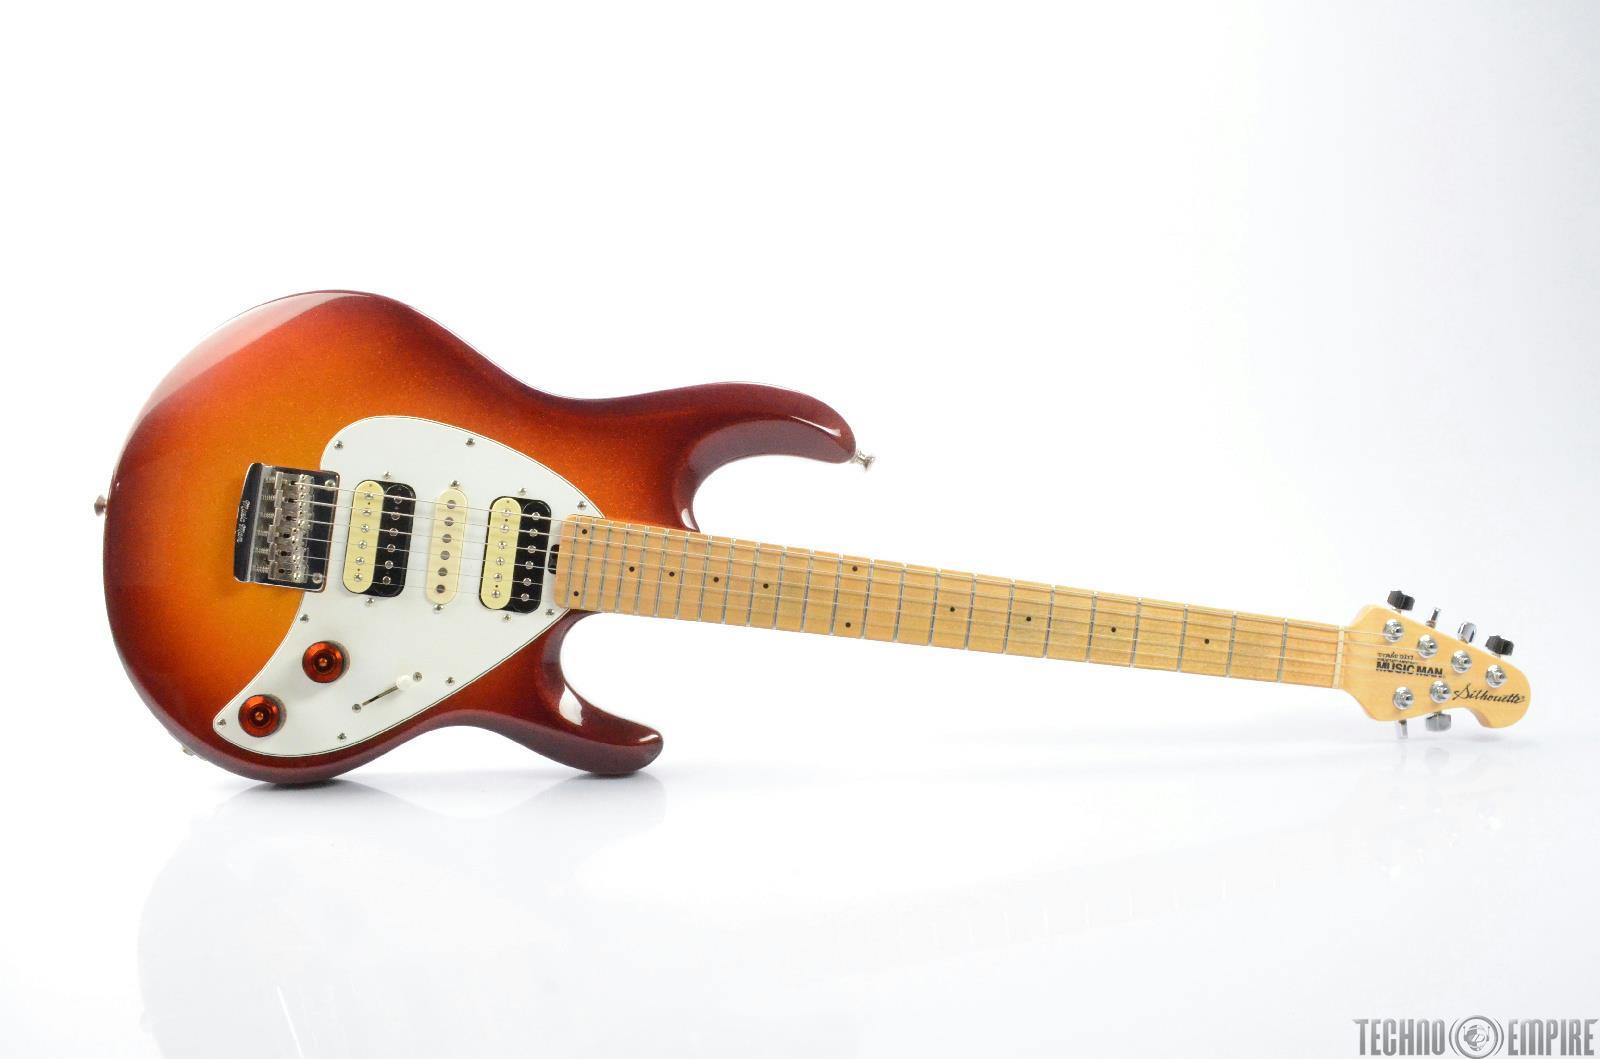 MUSIC MAN Silhouette HSH Electric Guitar w/ Rio Grande Pickup & Hard Case #26450